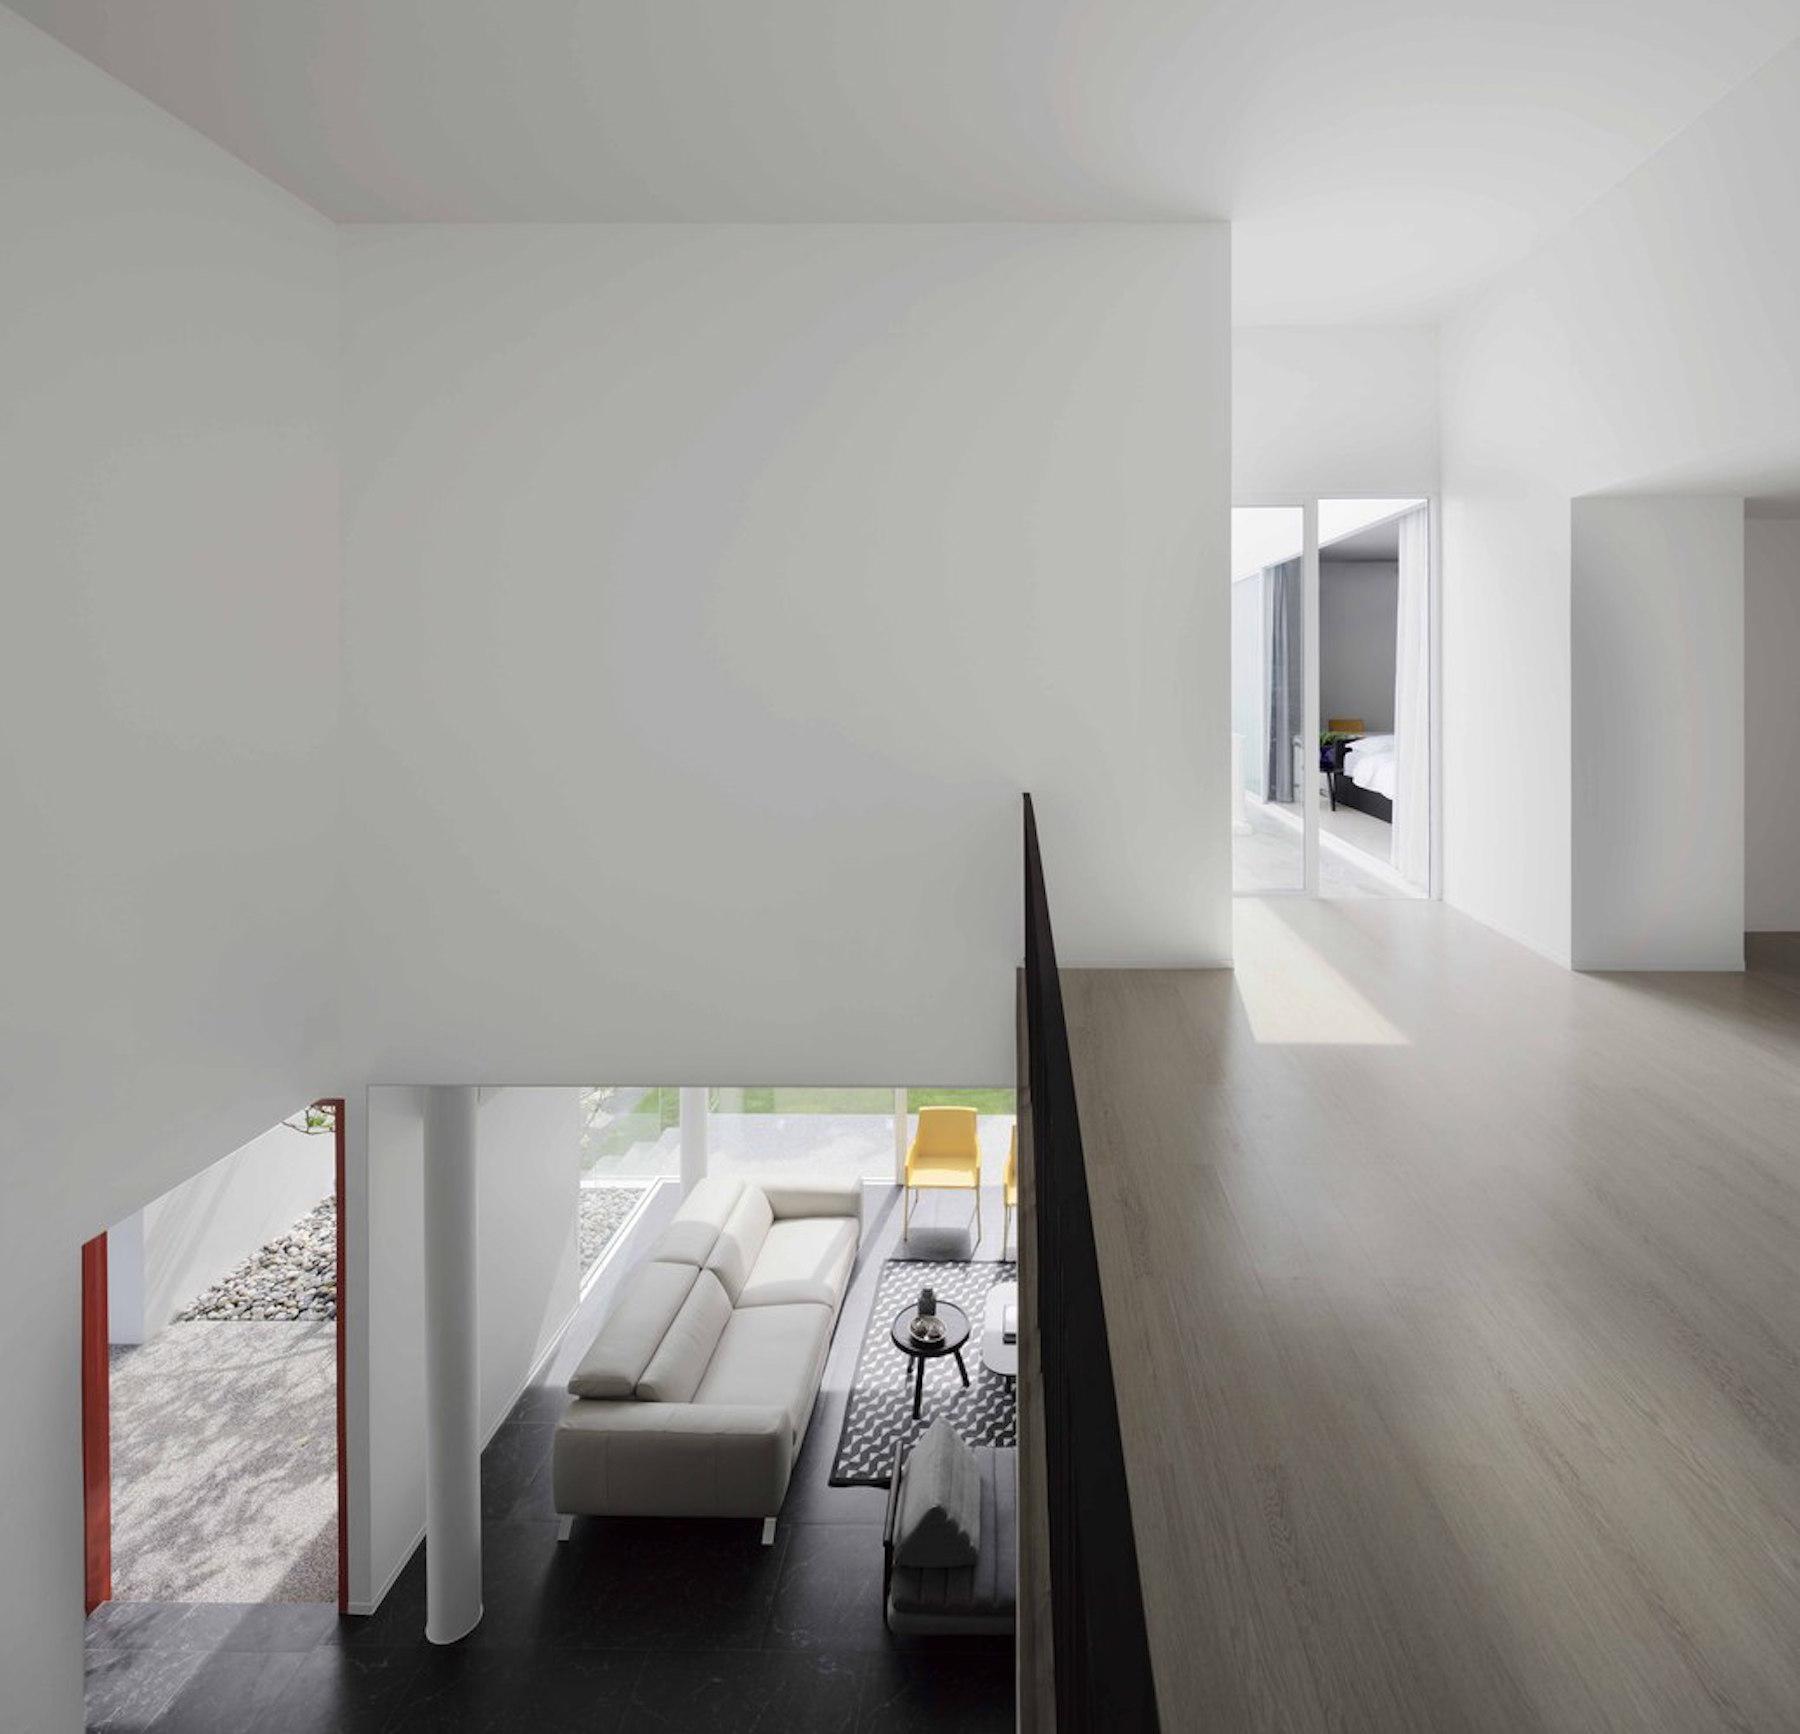 iGNANT-Architecture-Ayutt-And-Associates-Design-White-Box-House-17